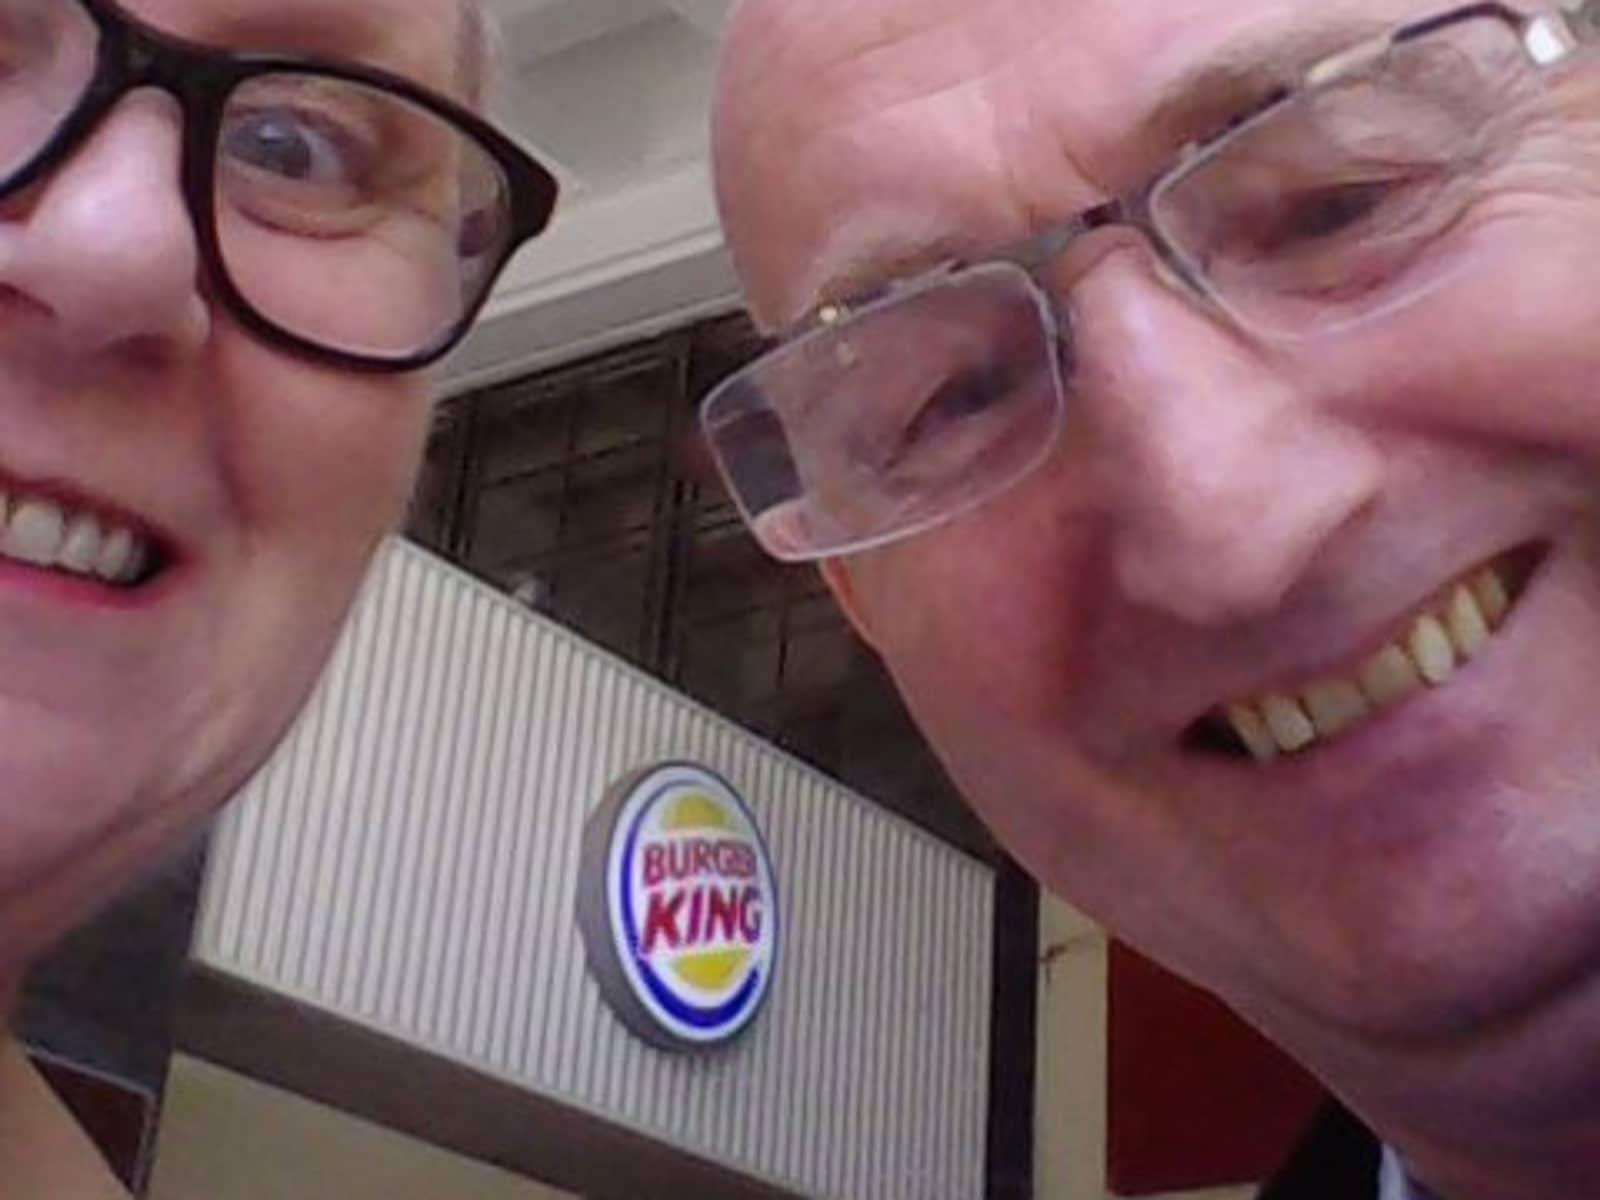 Irene & Chris from Edinburgh, United Kingdom